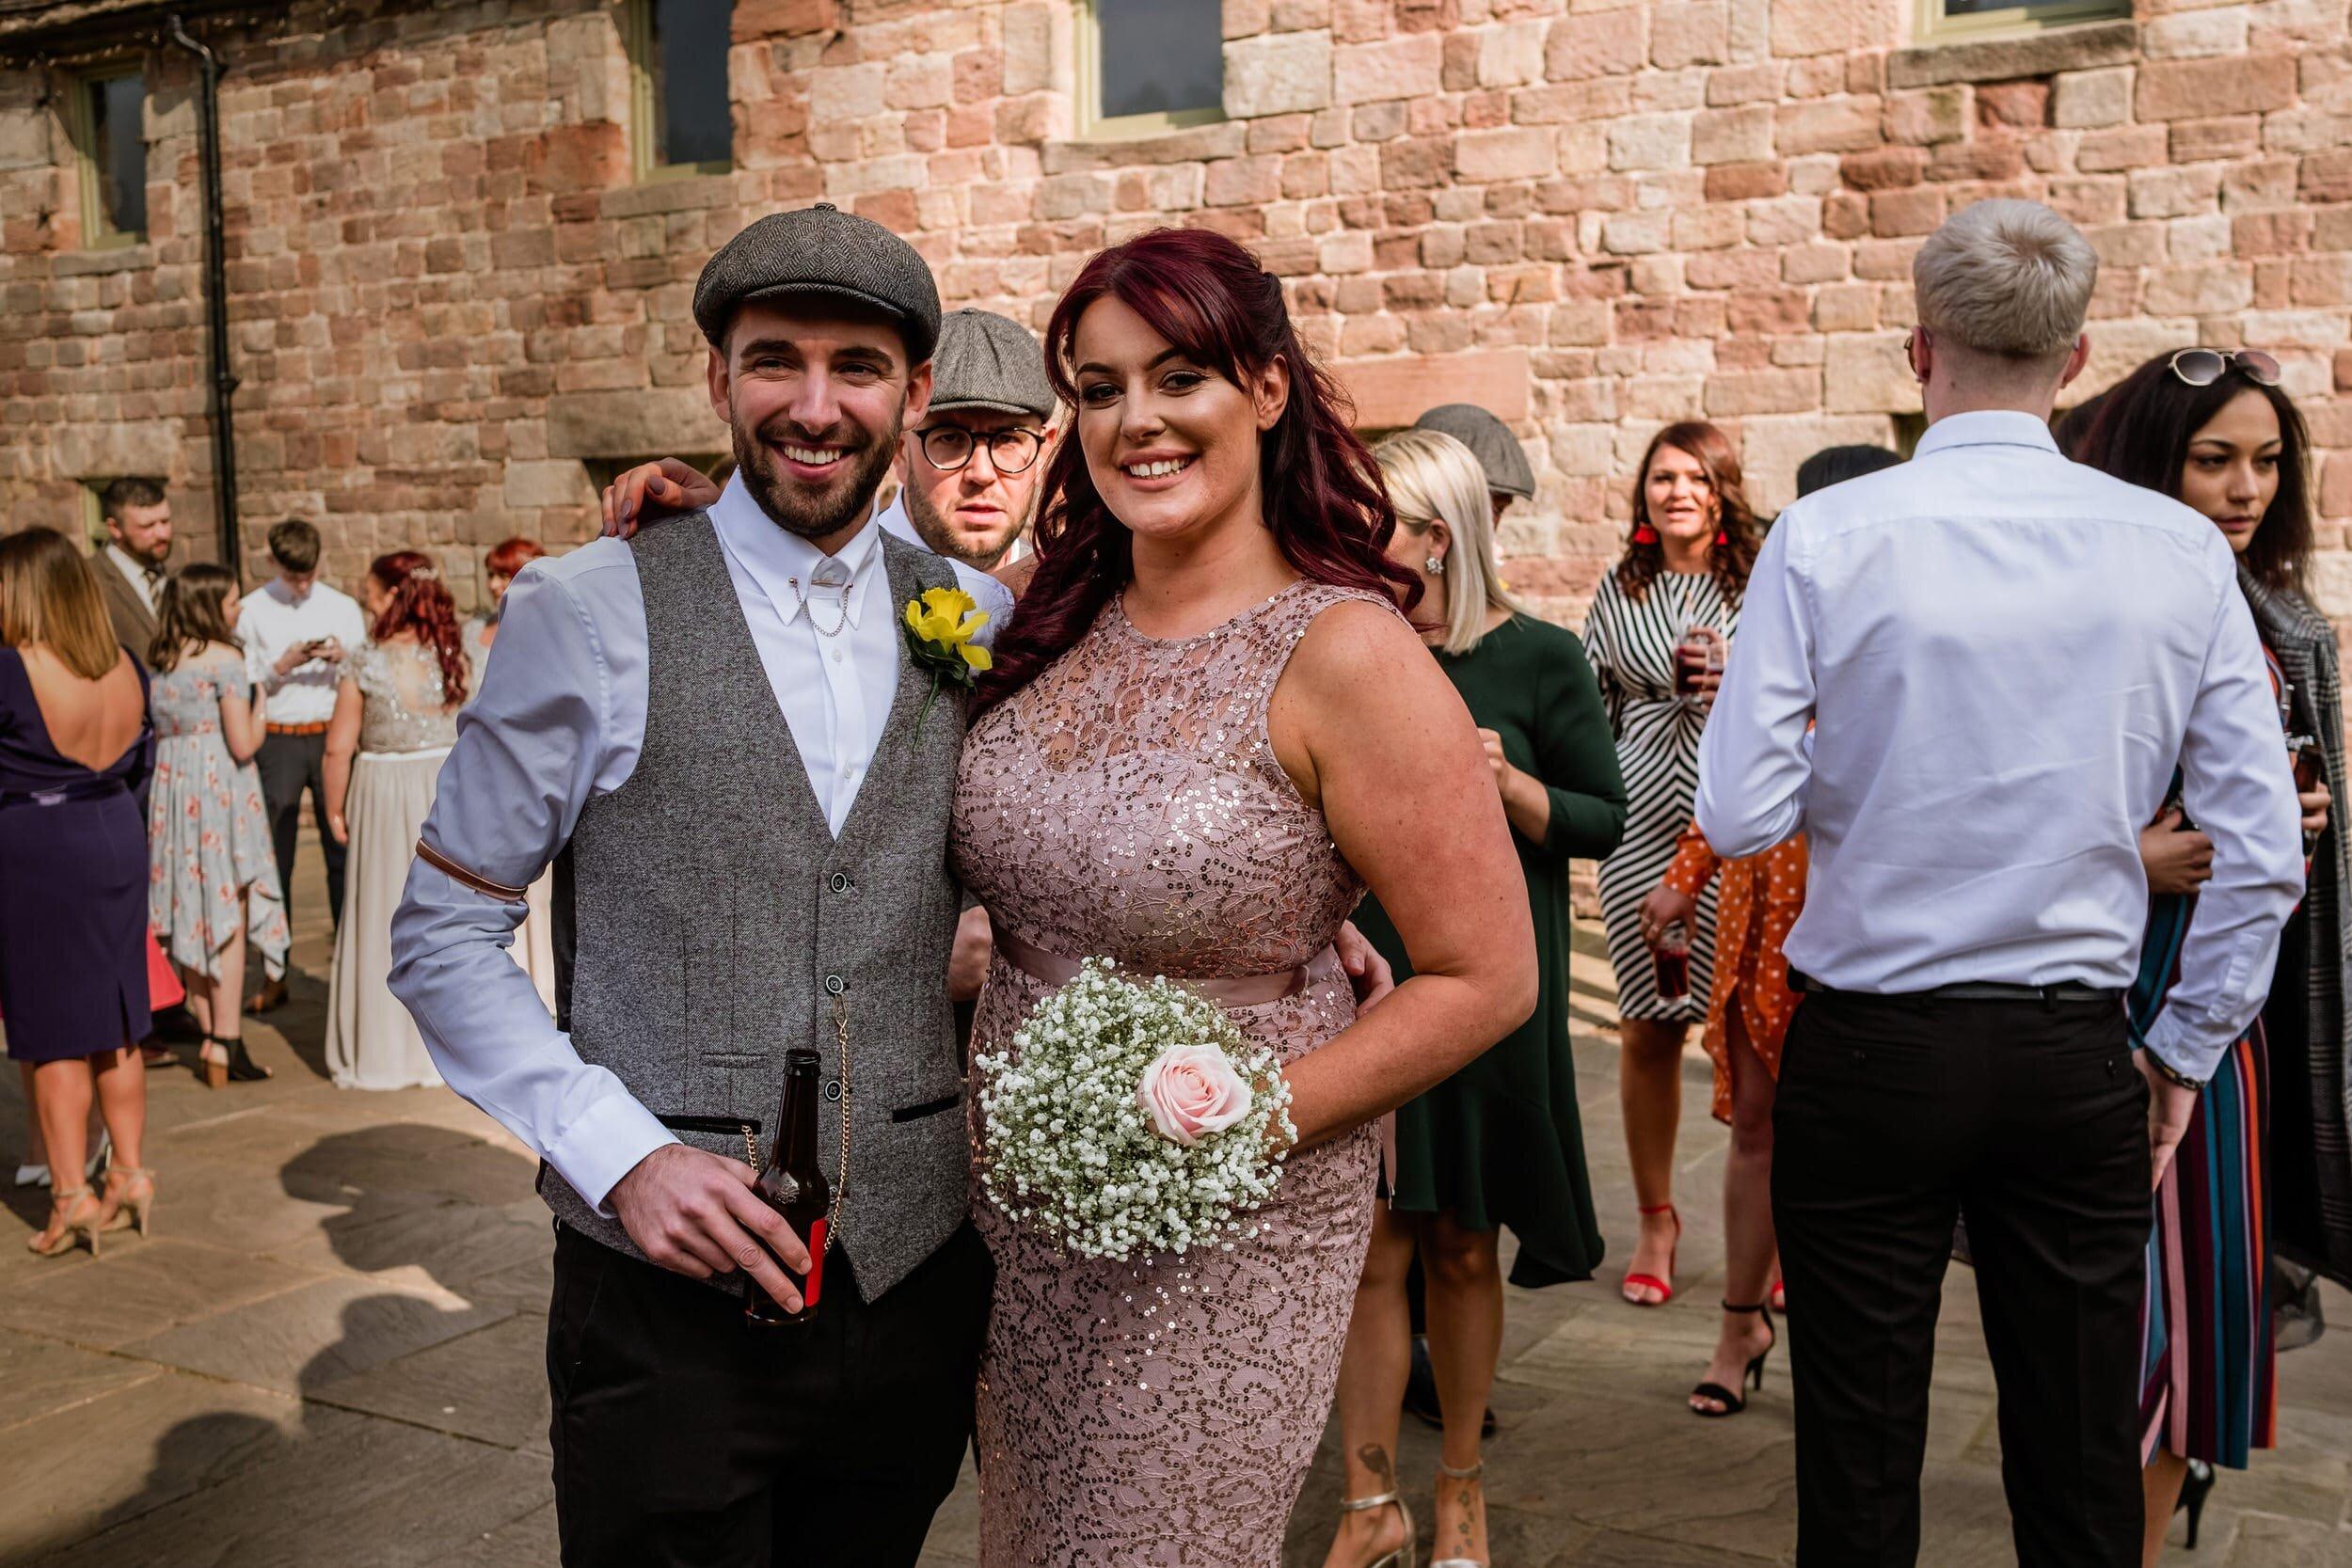 The Ashes Barns Wedding Photographer00105.jpg